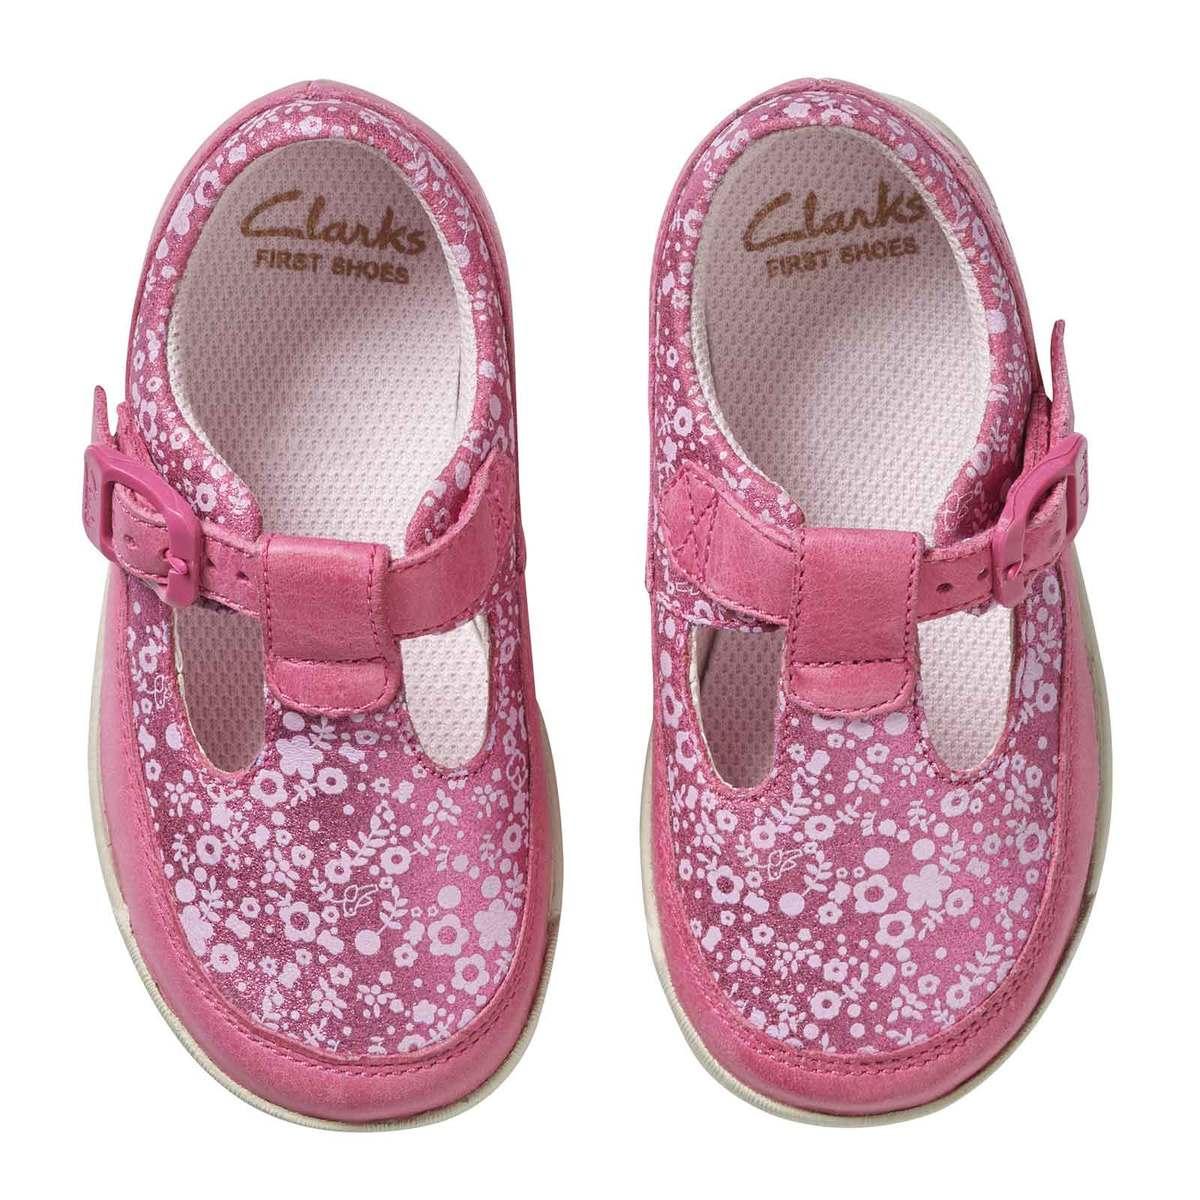 Buy clarks kids shoes voucher cheap,up